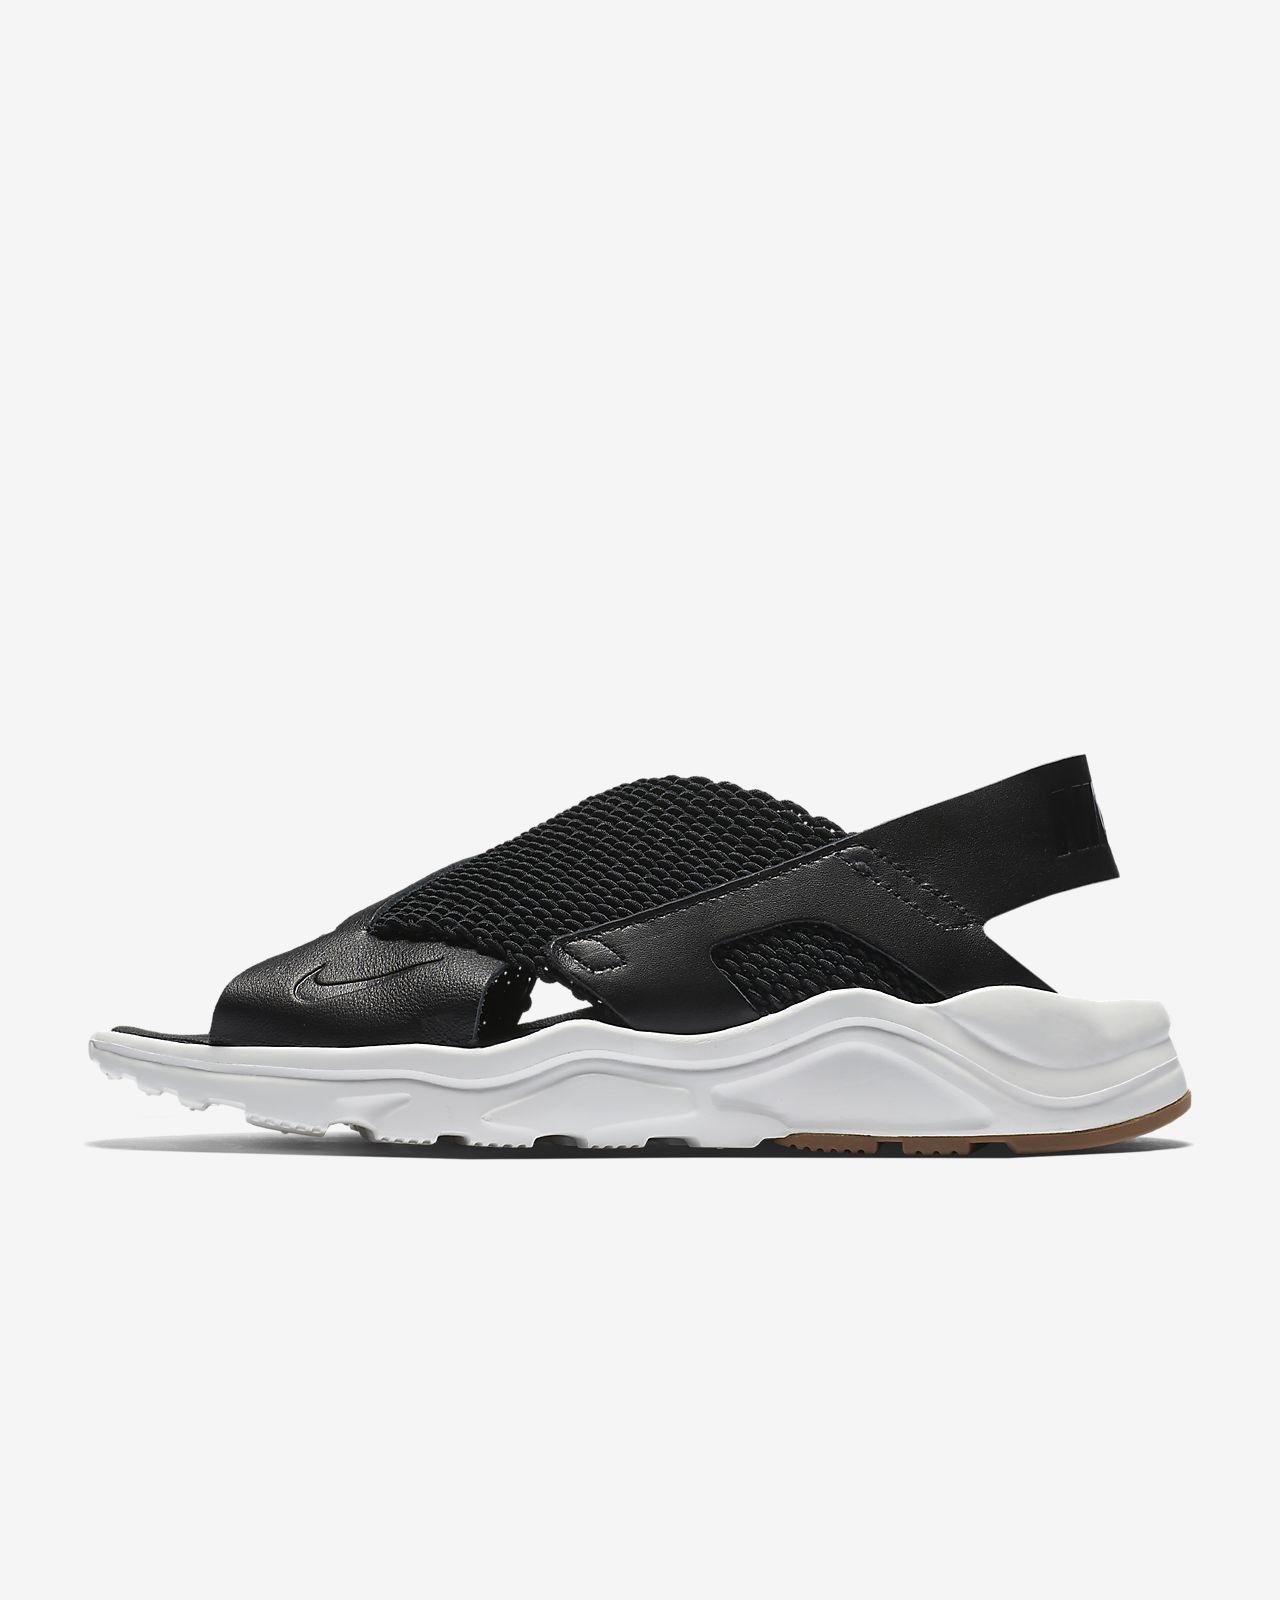 Scarpa Nike Air Max Command Uomo Nero nike neri Casual